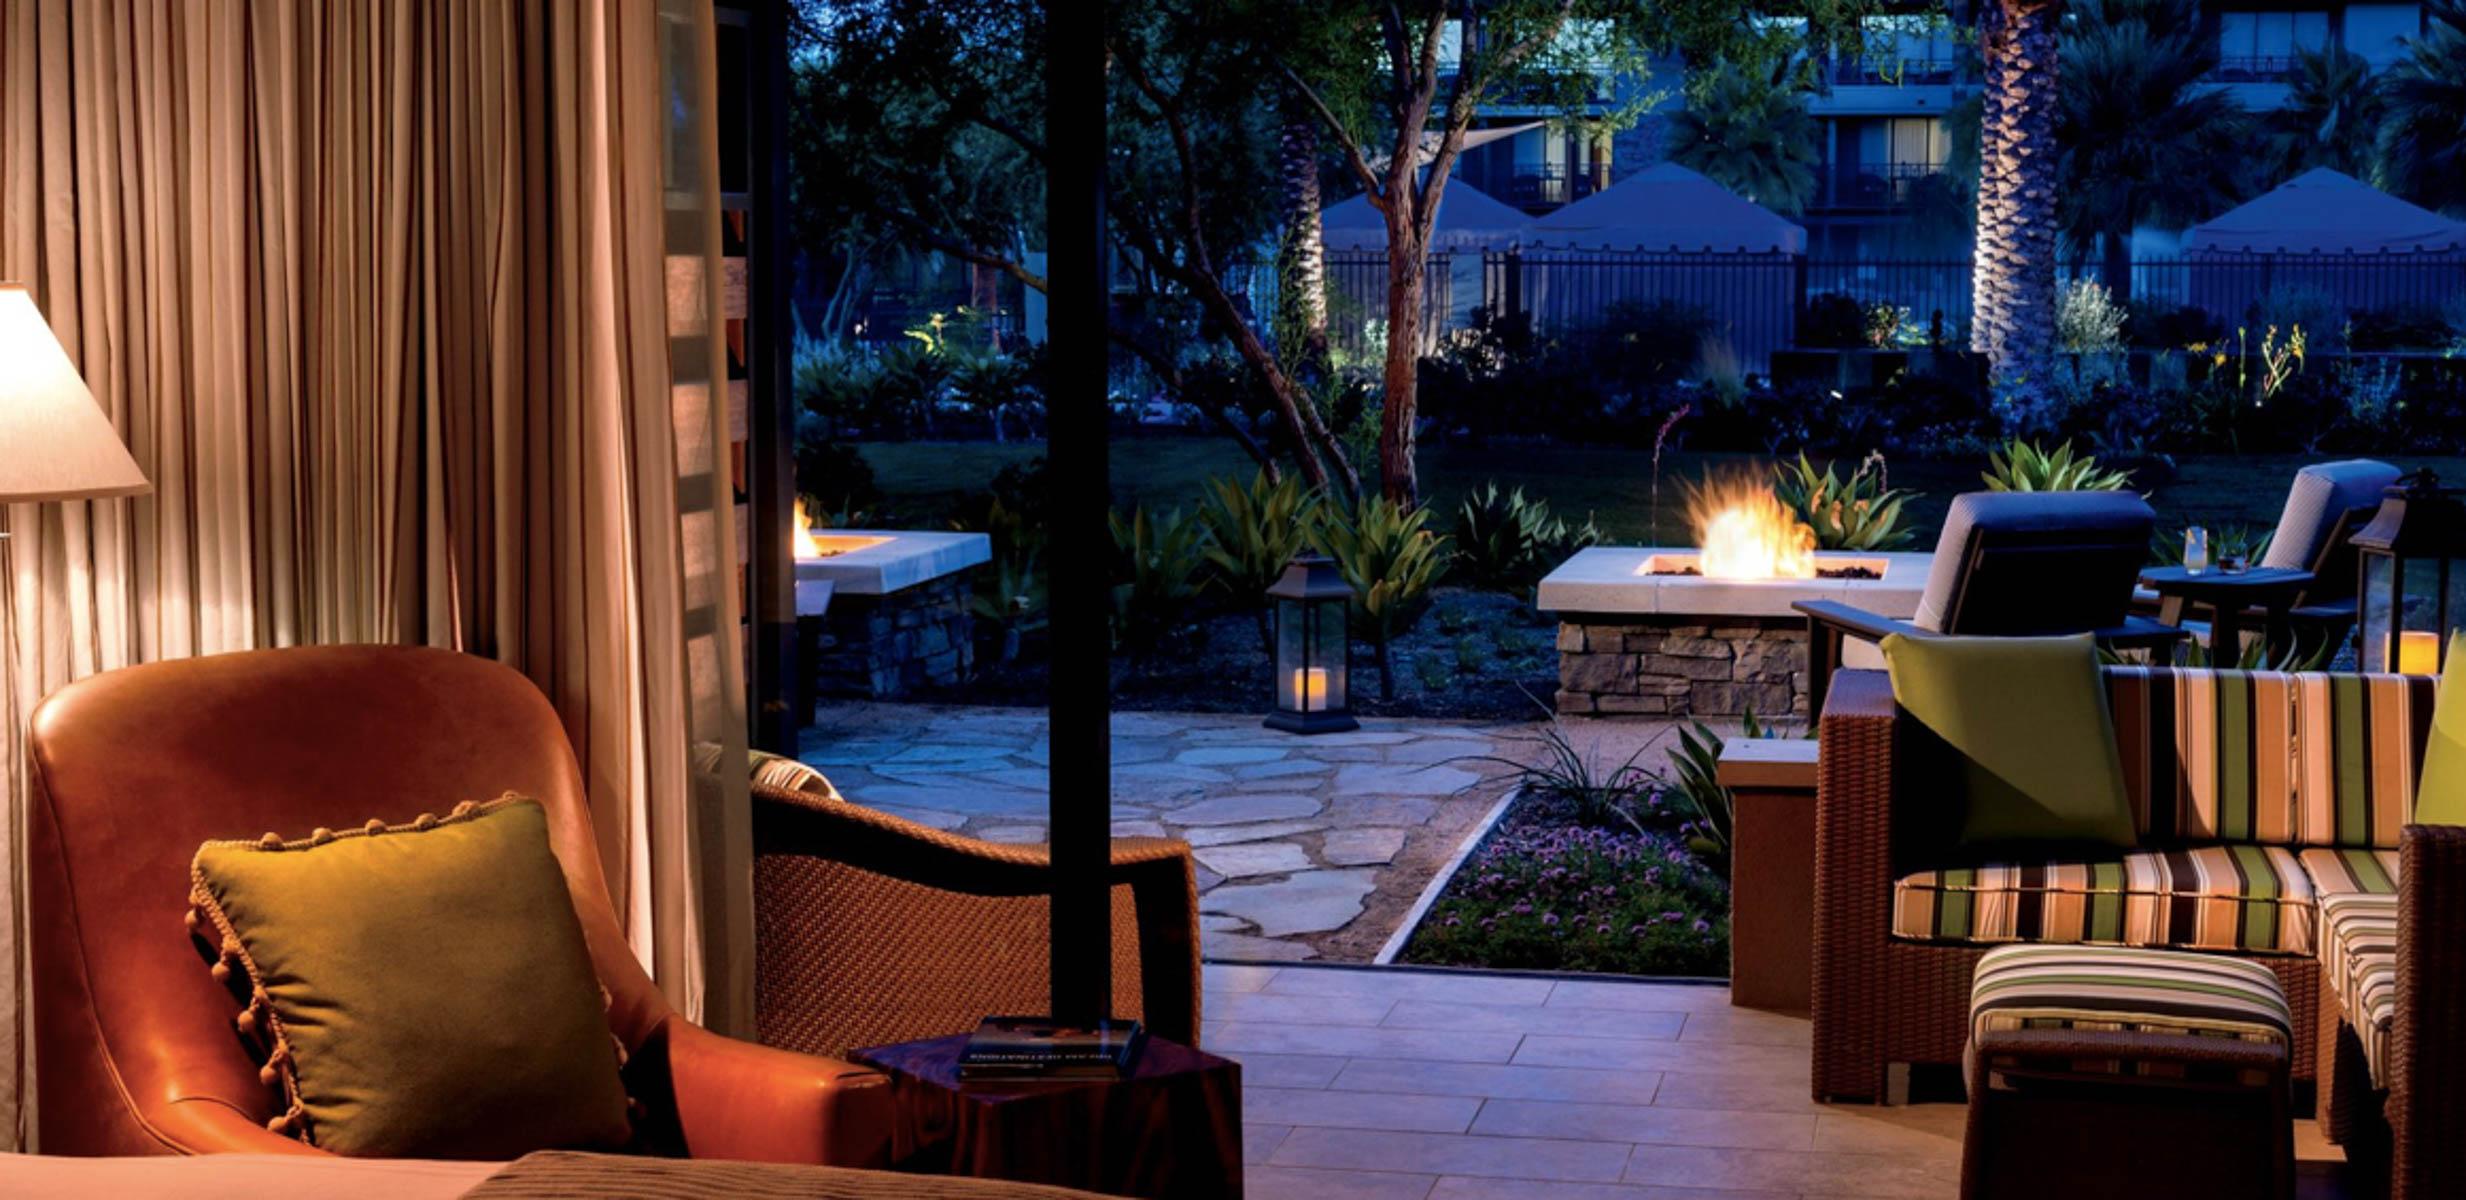 Best Palm Desert Travel Ideas_Palm Desert Hotels_Palm Desert_resorts_Addie Bell-14.jpg